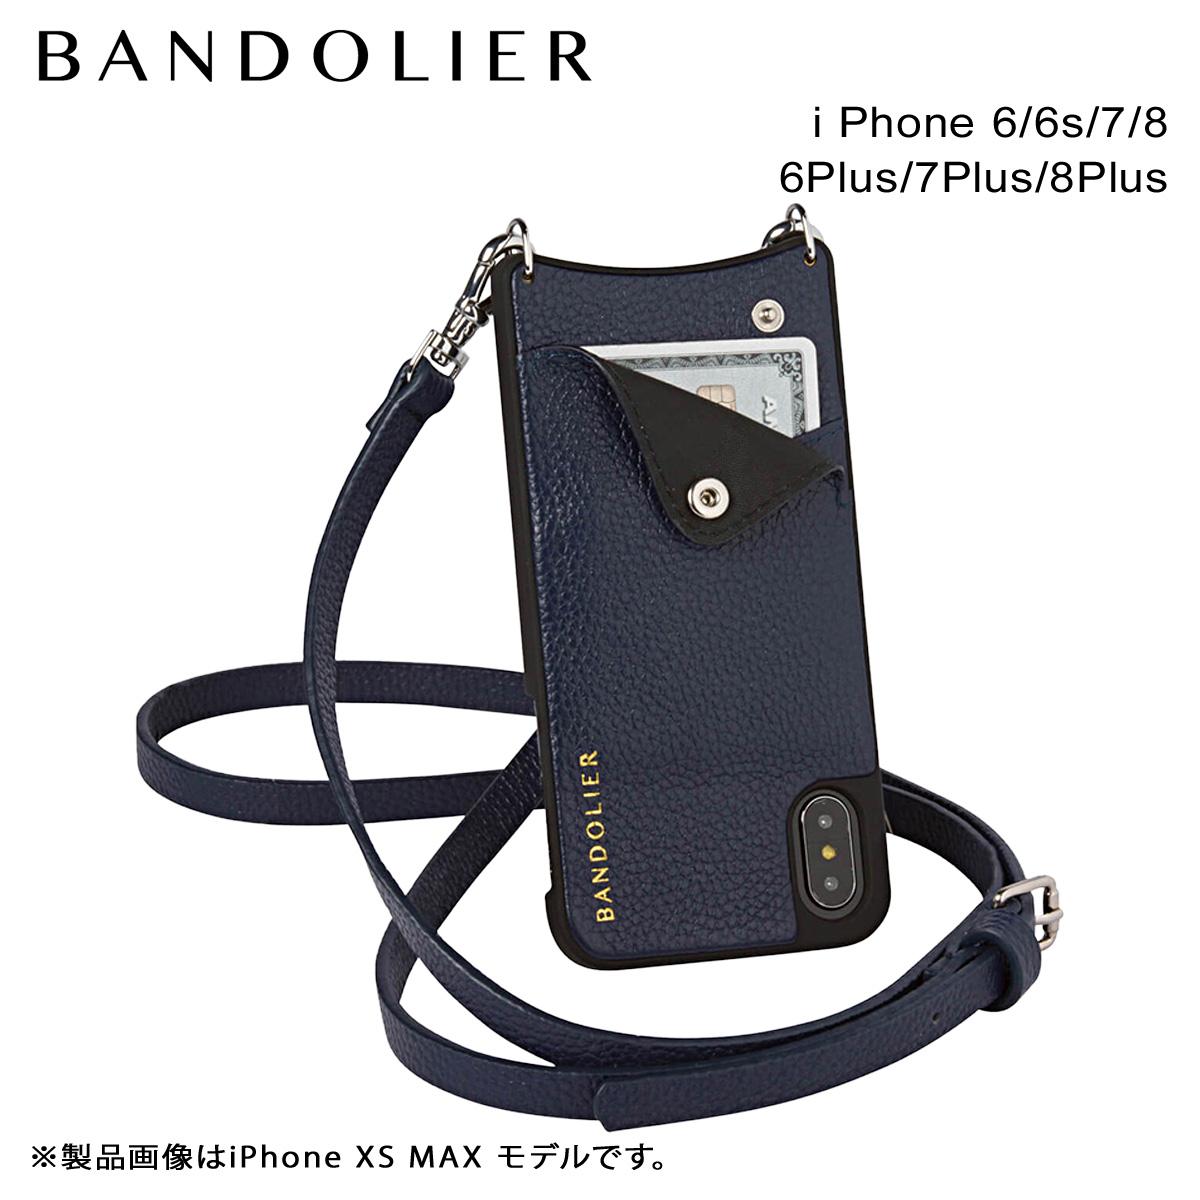 BANDOLIER EMMA NAVY バンドリヤー iPhone8 iPhone7 7Plus 6s ケース スマホ アイフォン プラス メンズ レディース ネイビー [9/14 追加入荷]